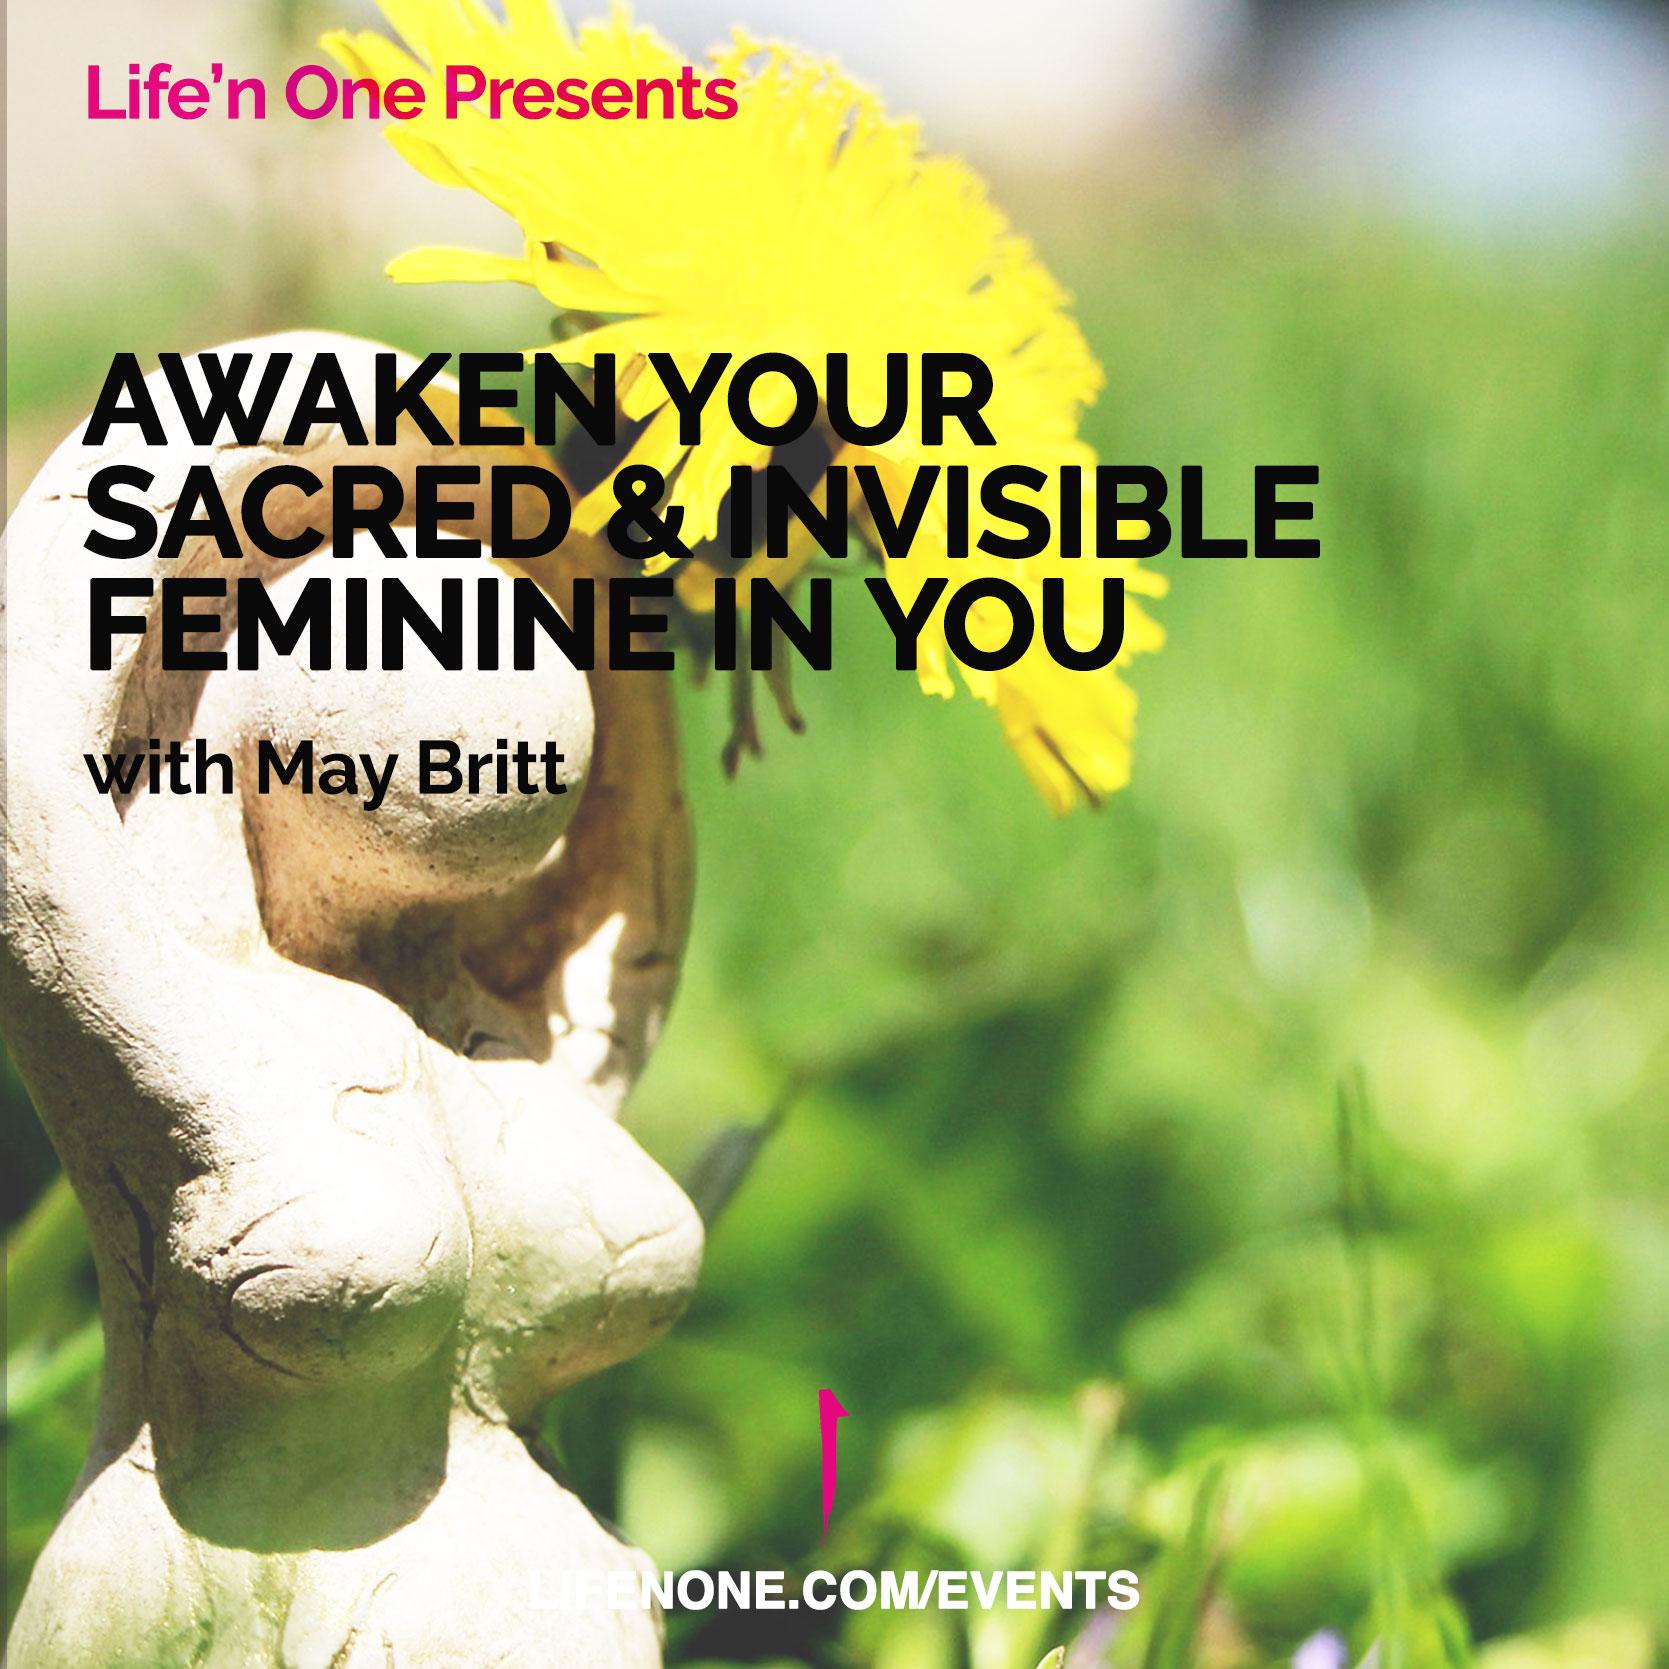 awaken-your-sacred-feminine-in-you.jpg